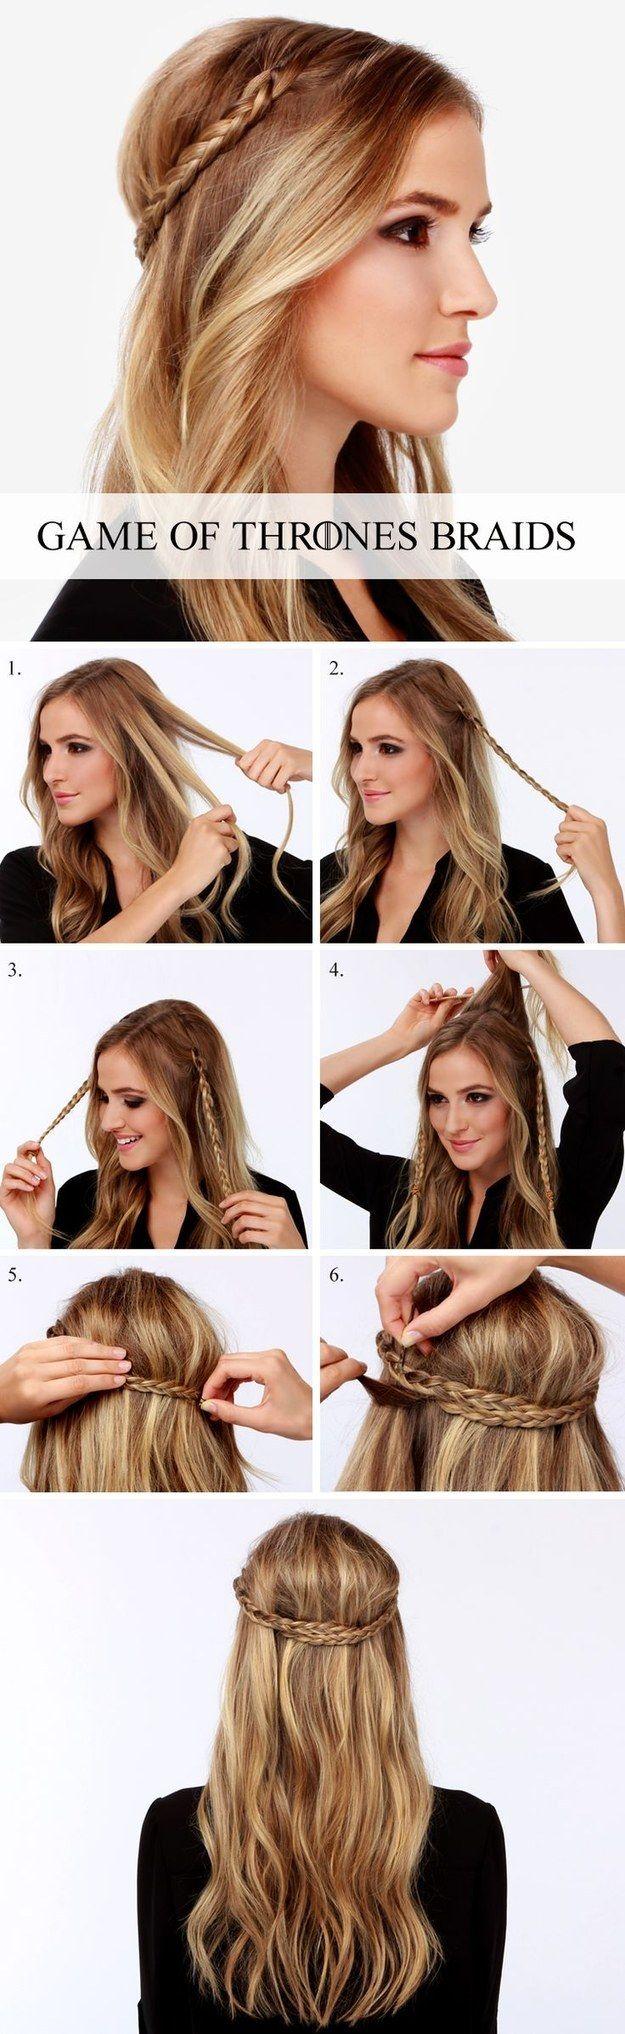 Alex Tried This Game Of Thrones Braids Tutorial Hair Styles Pinterest Hair Hairstyle